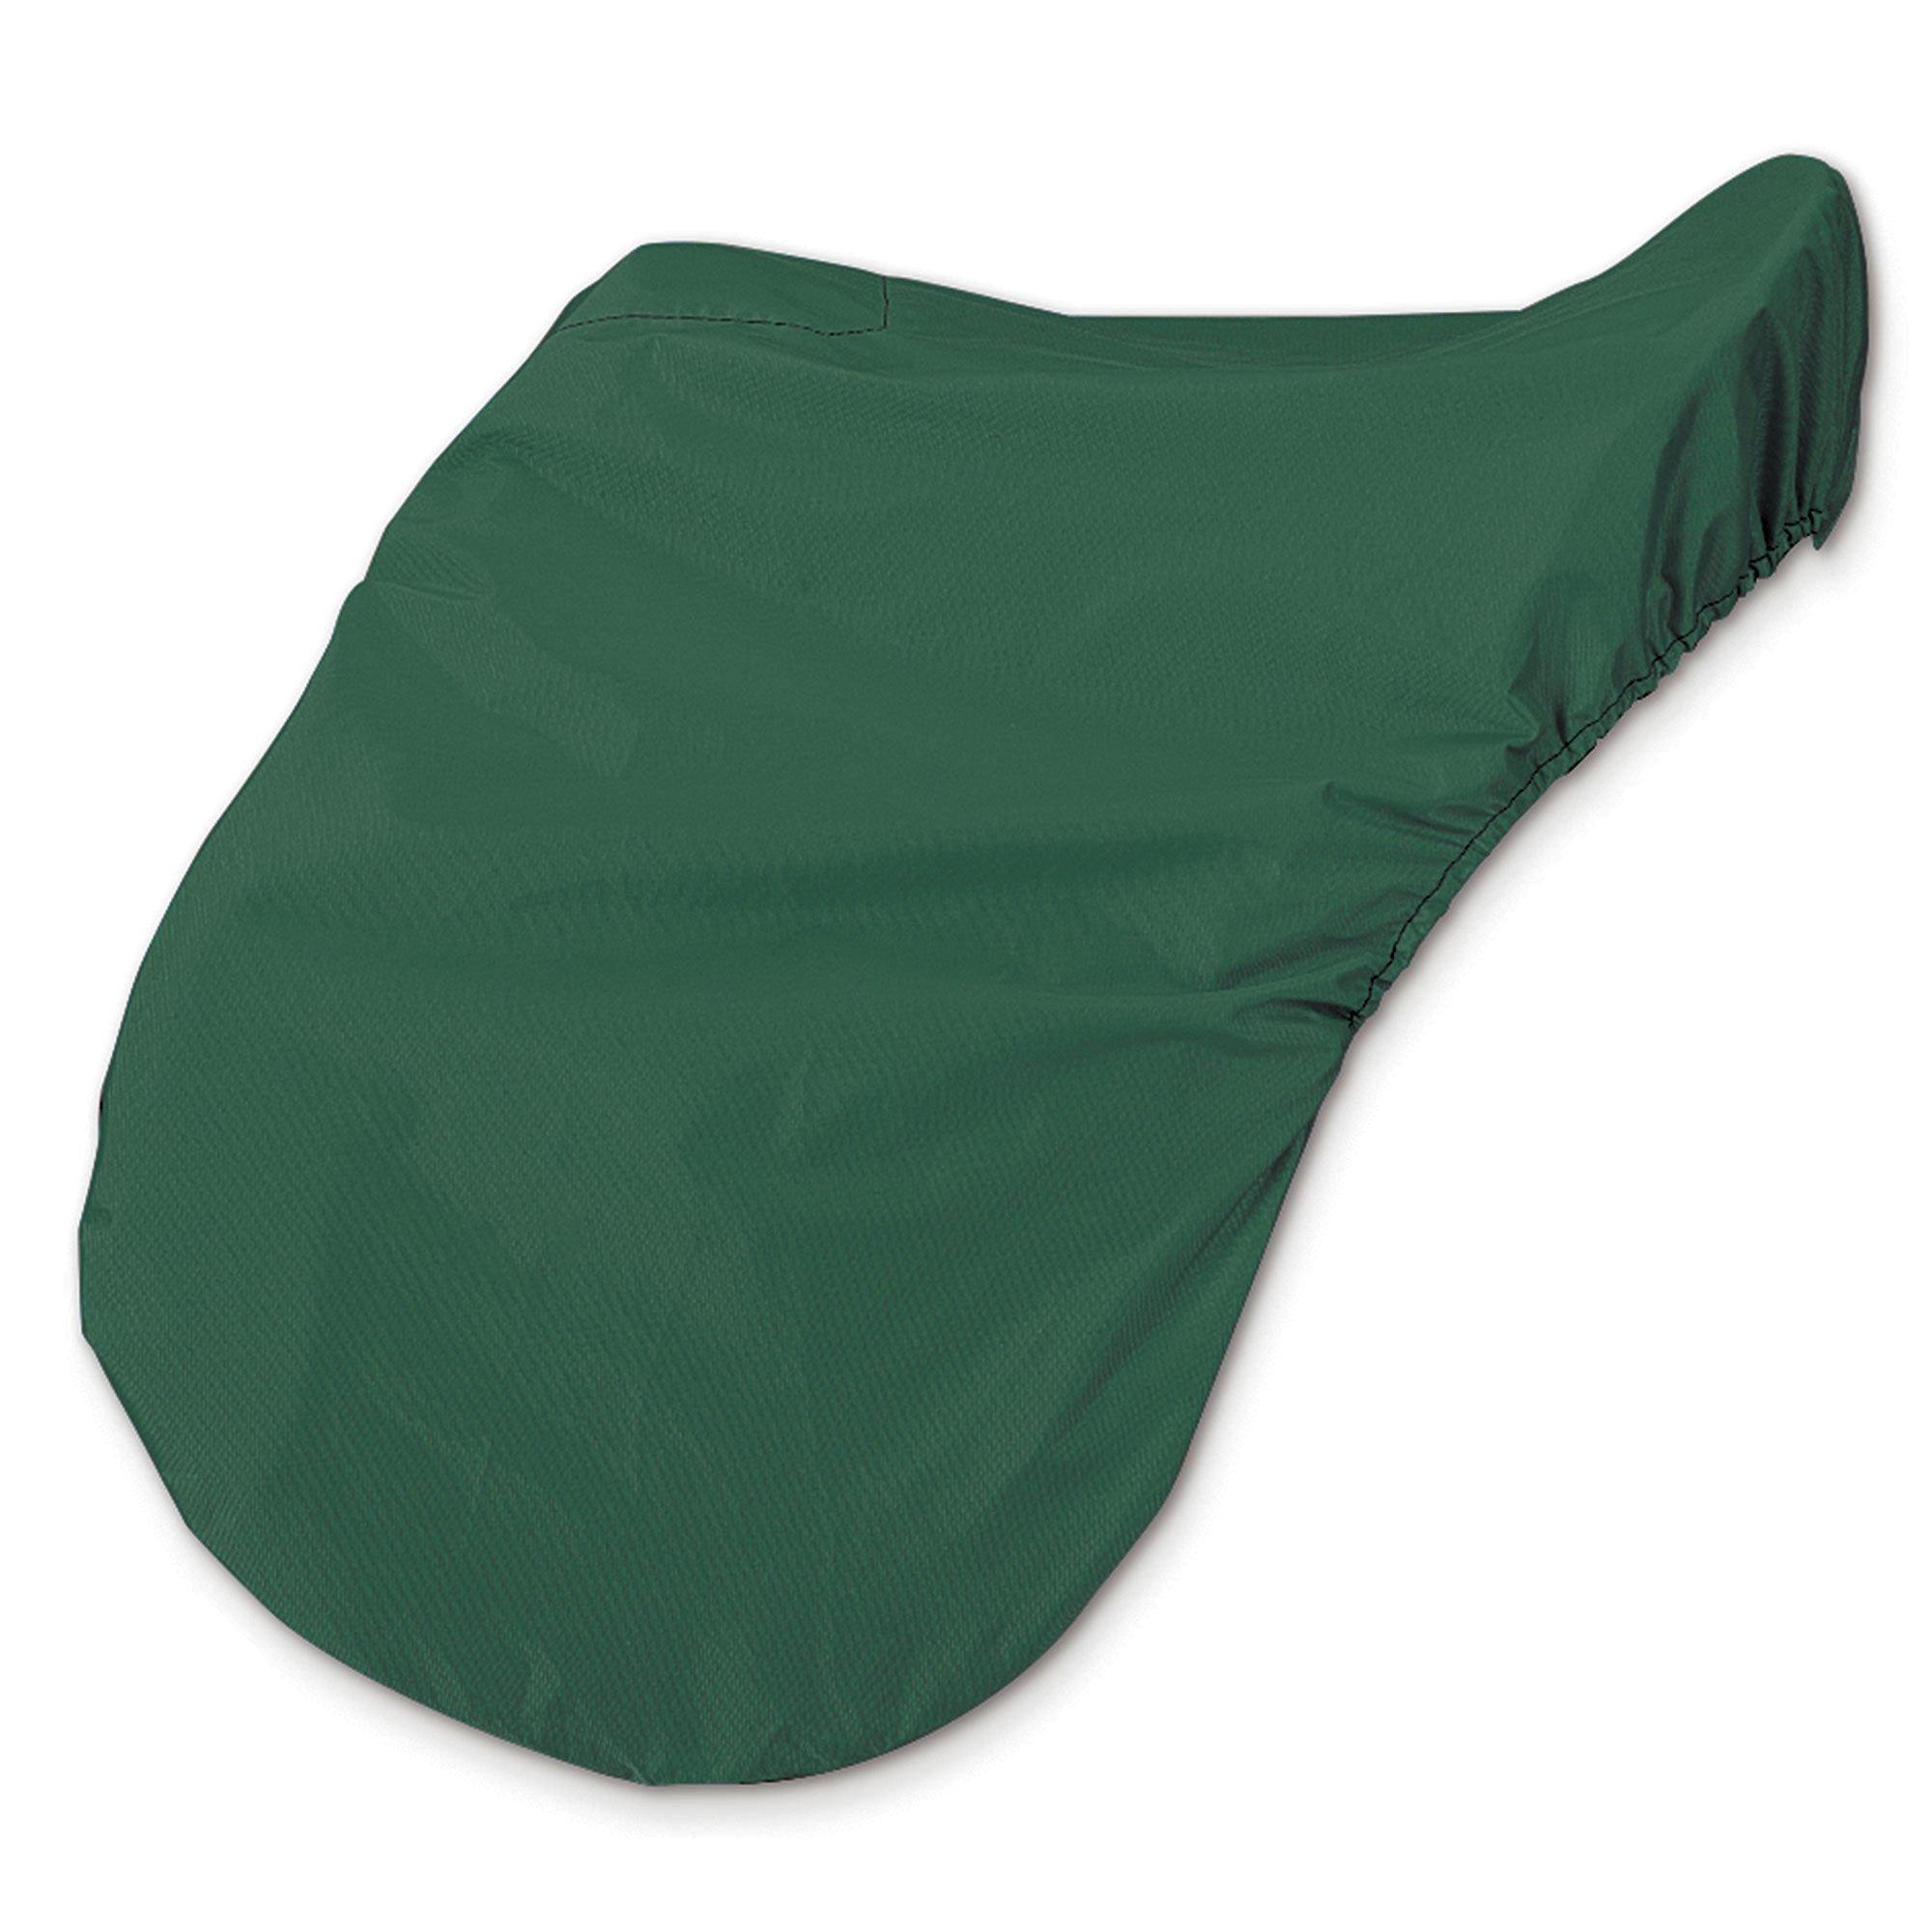 Toklat English All Purpose Saddle Cover Green